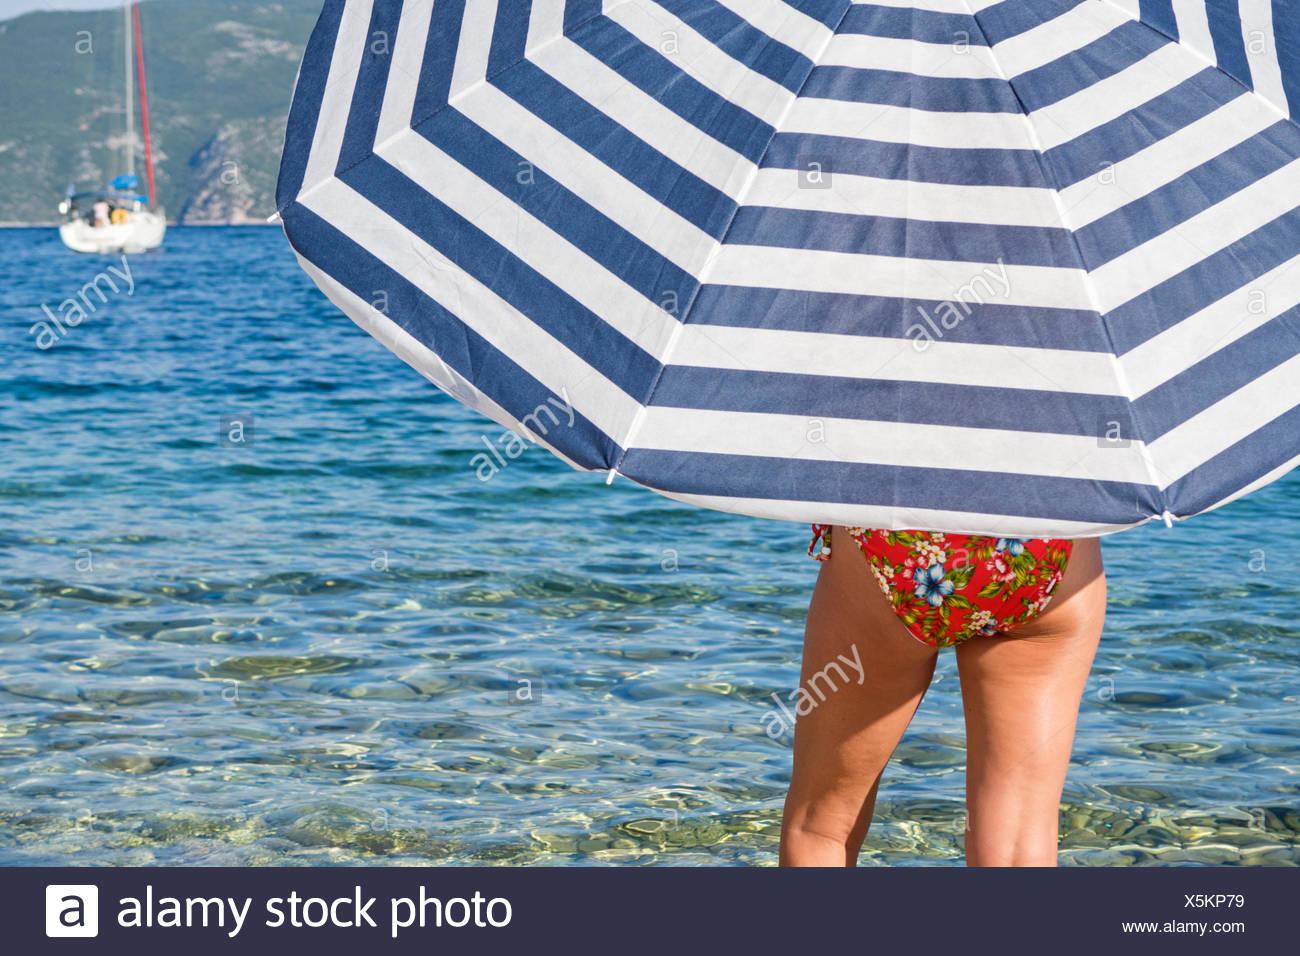 Woman in bikini under striped beach umbrella at ocean - Stock Image